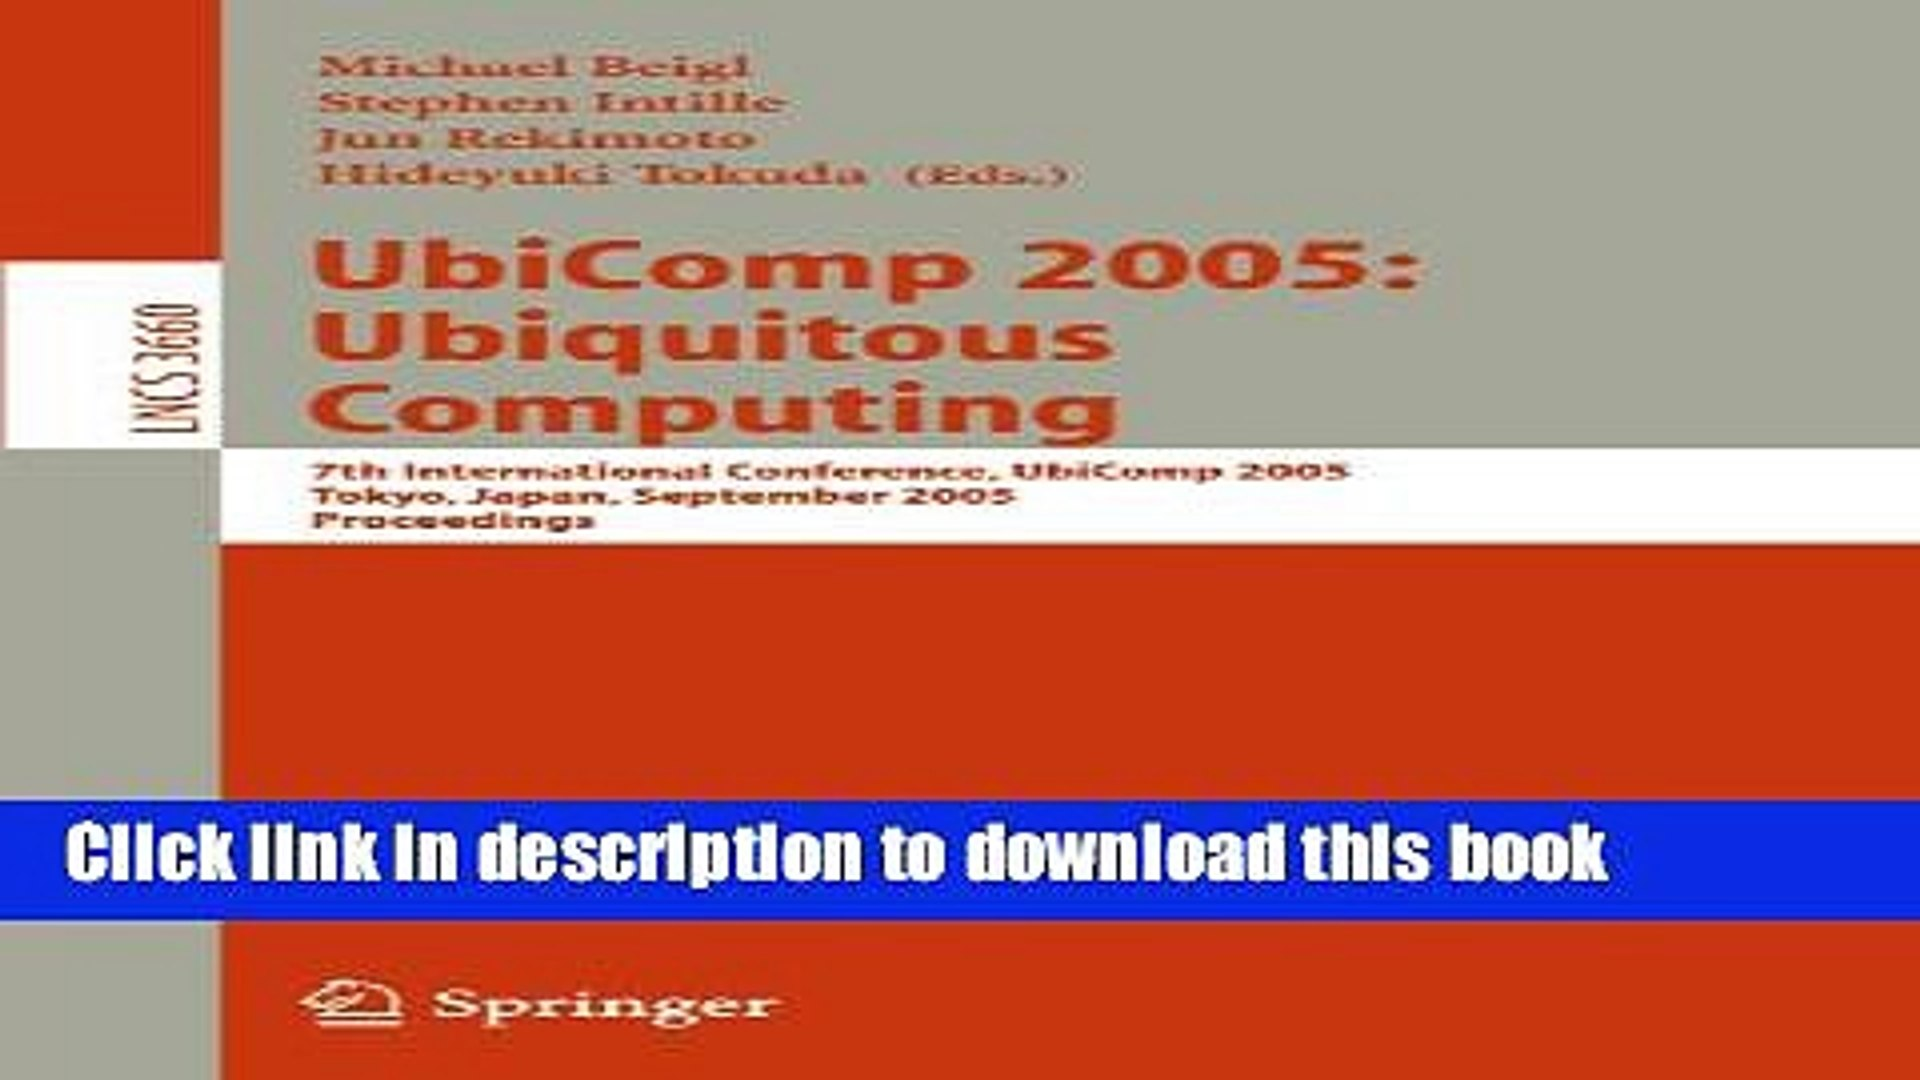 [Popular Books] UbiComp 2005: Ubiquitous Computing: 7th International Conference, UbiComp 2005,